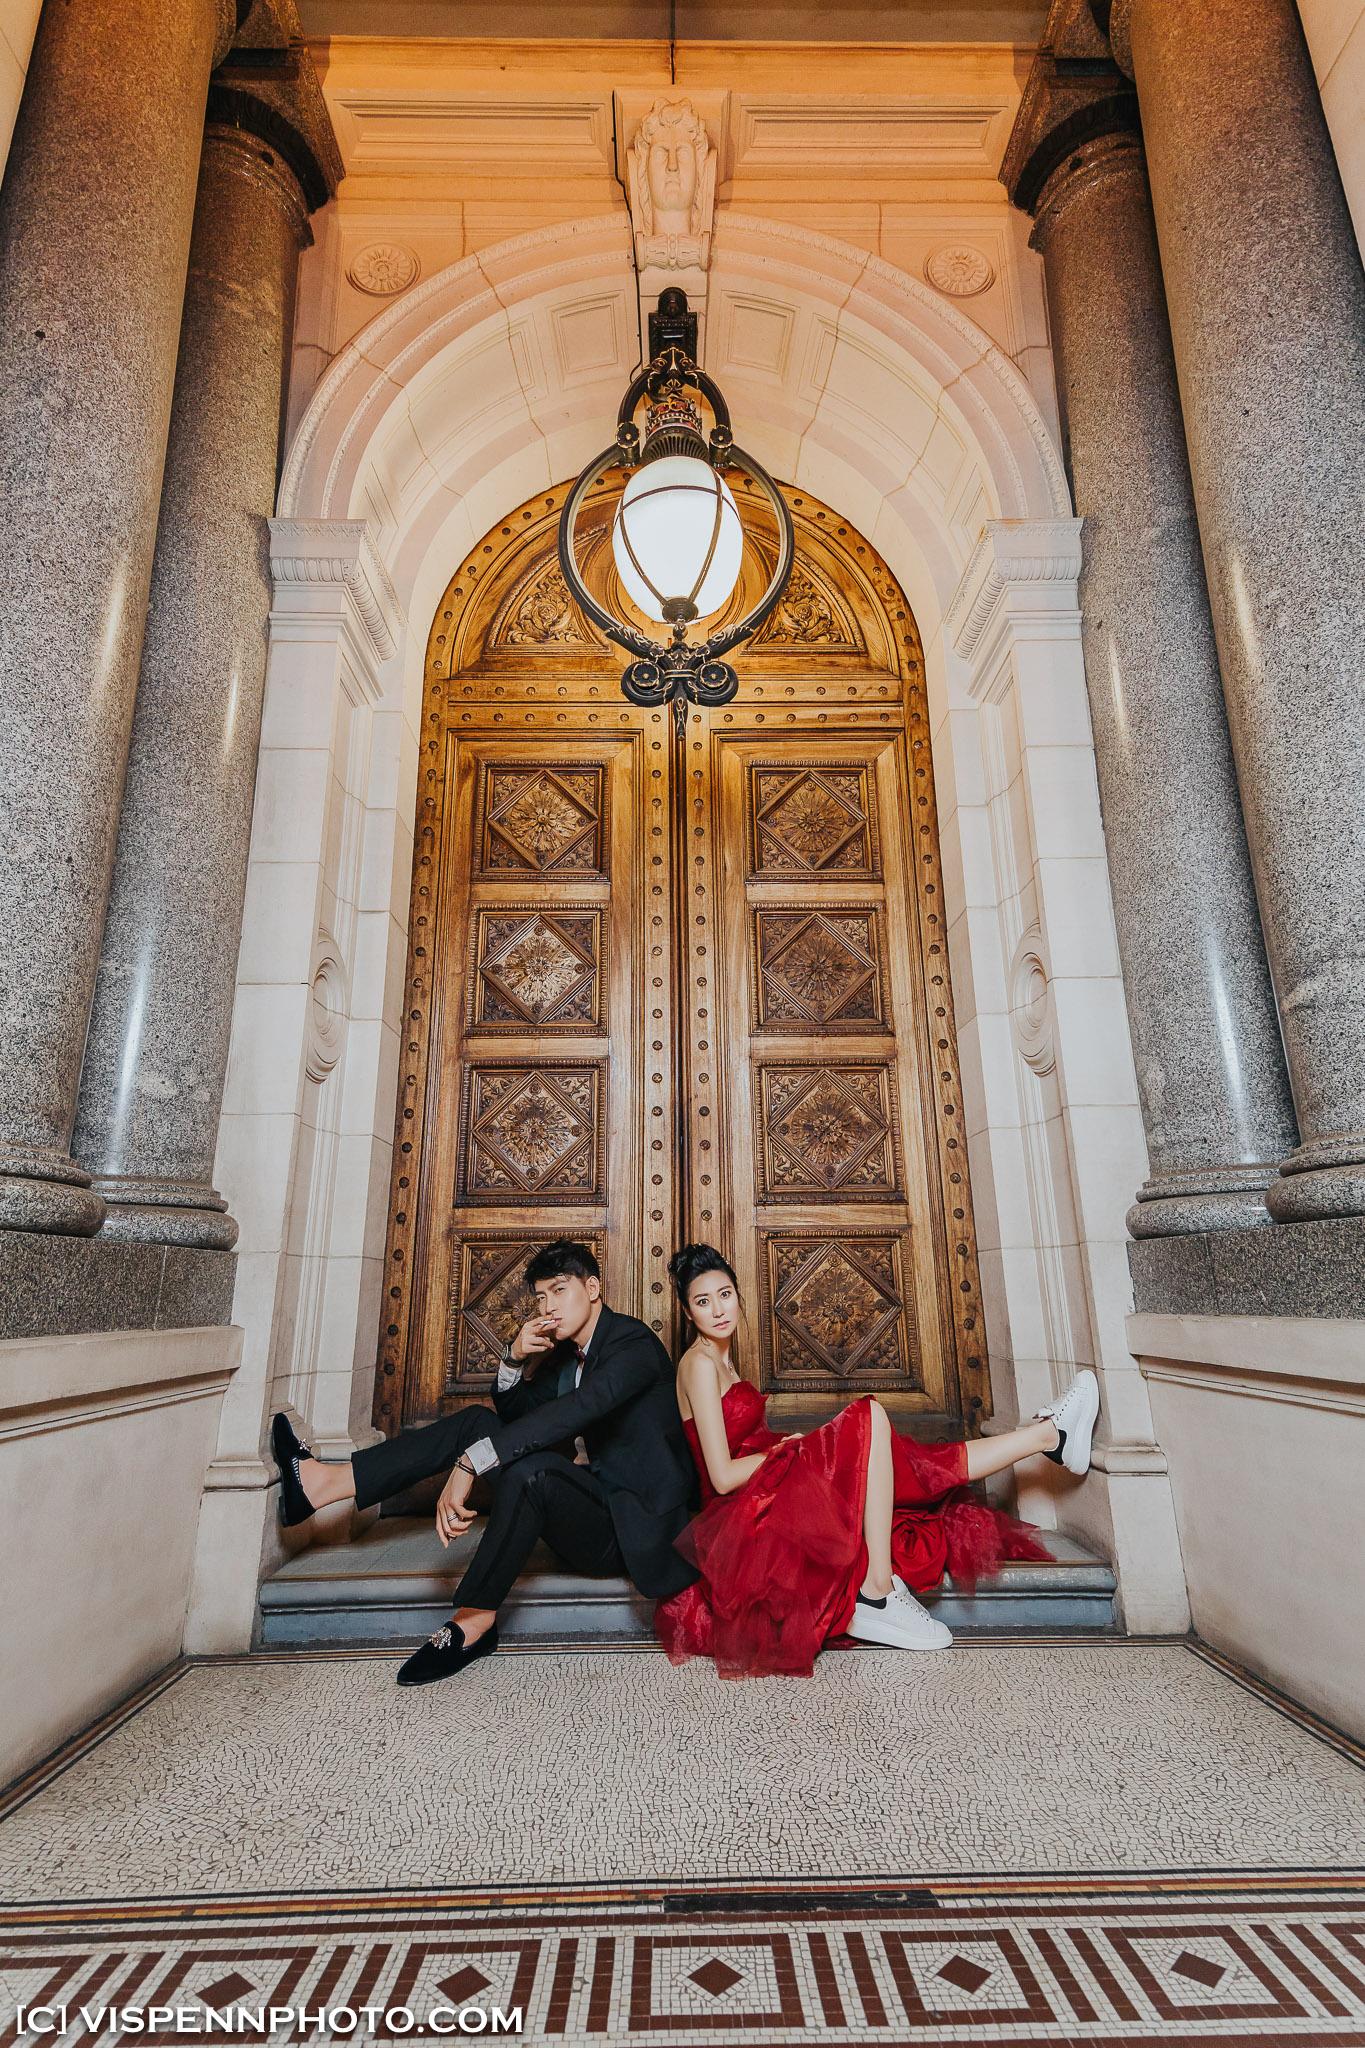 PRE WEDDING Photography Melbourne 5D4 4236